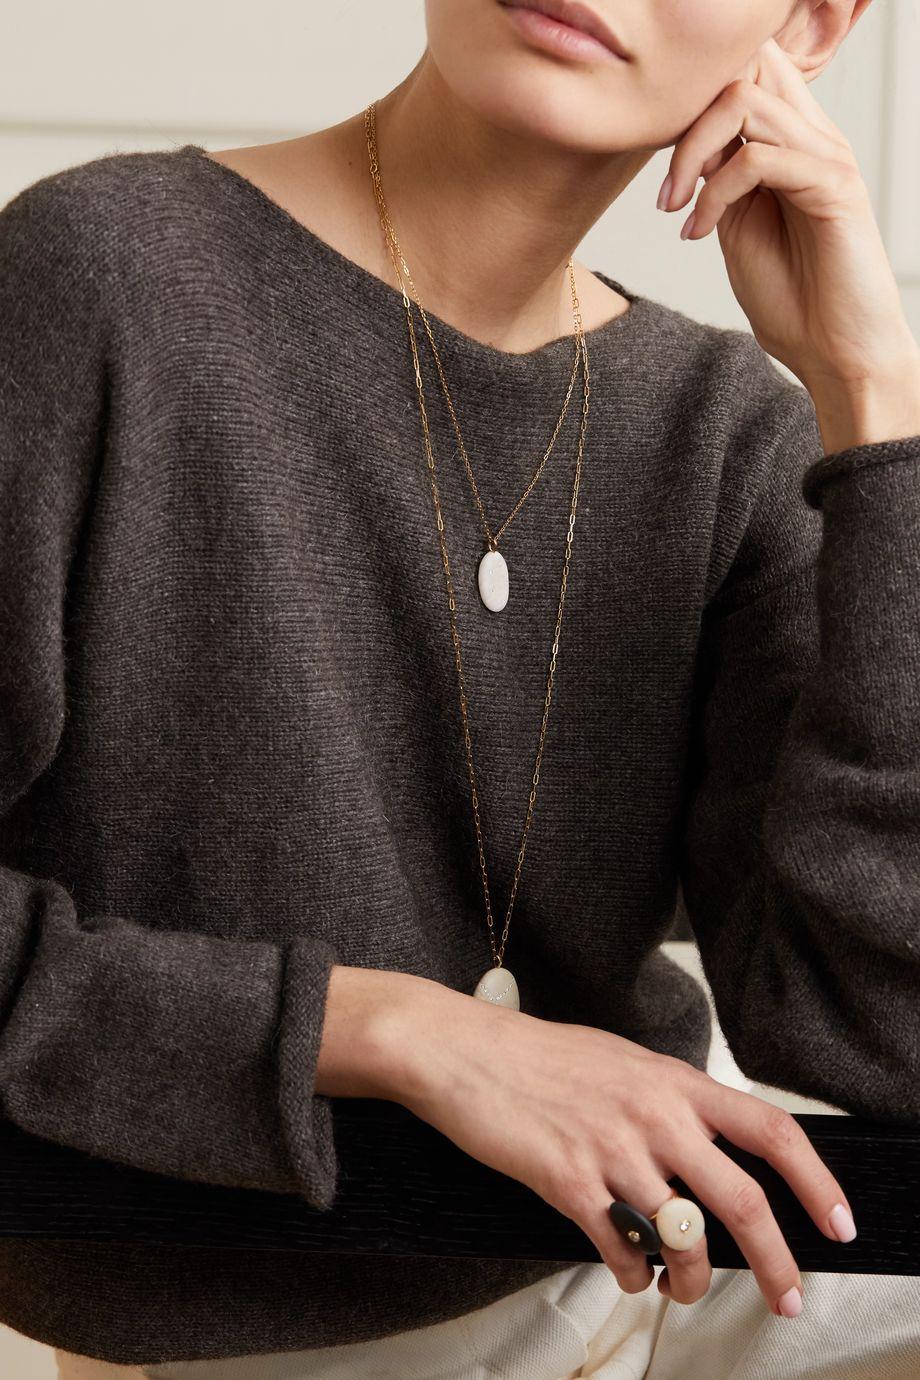 CVC Stones Penta 18-karat gold, stone and diamond necklace